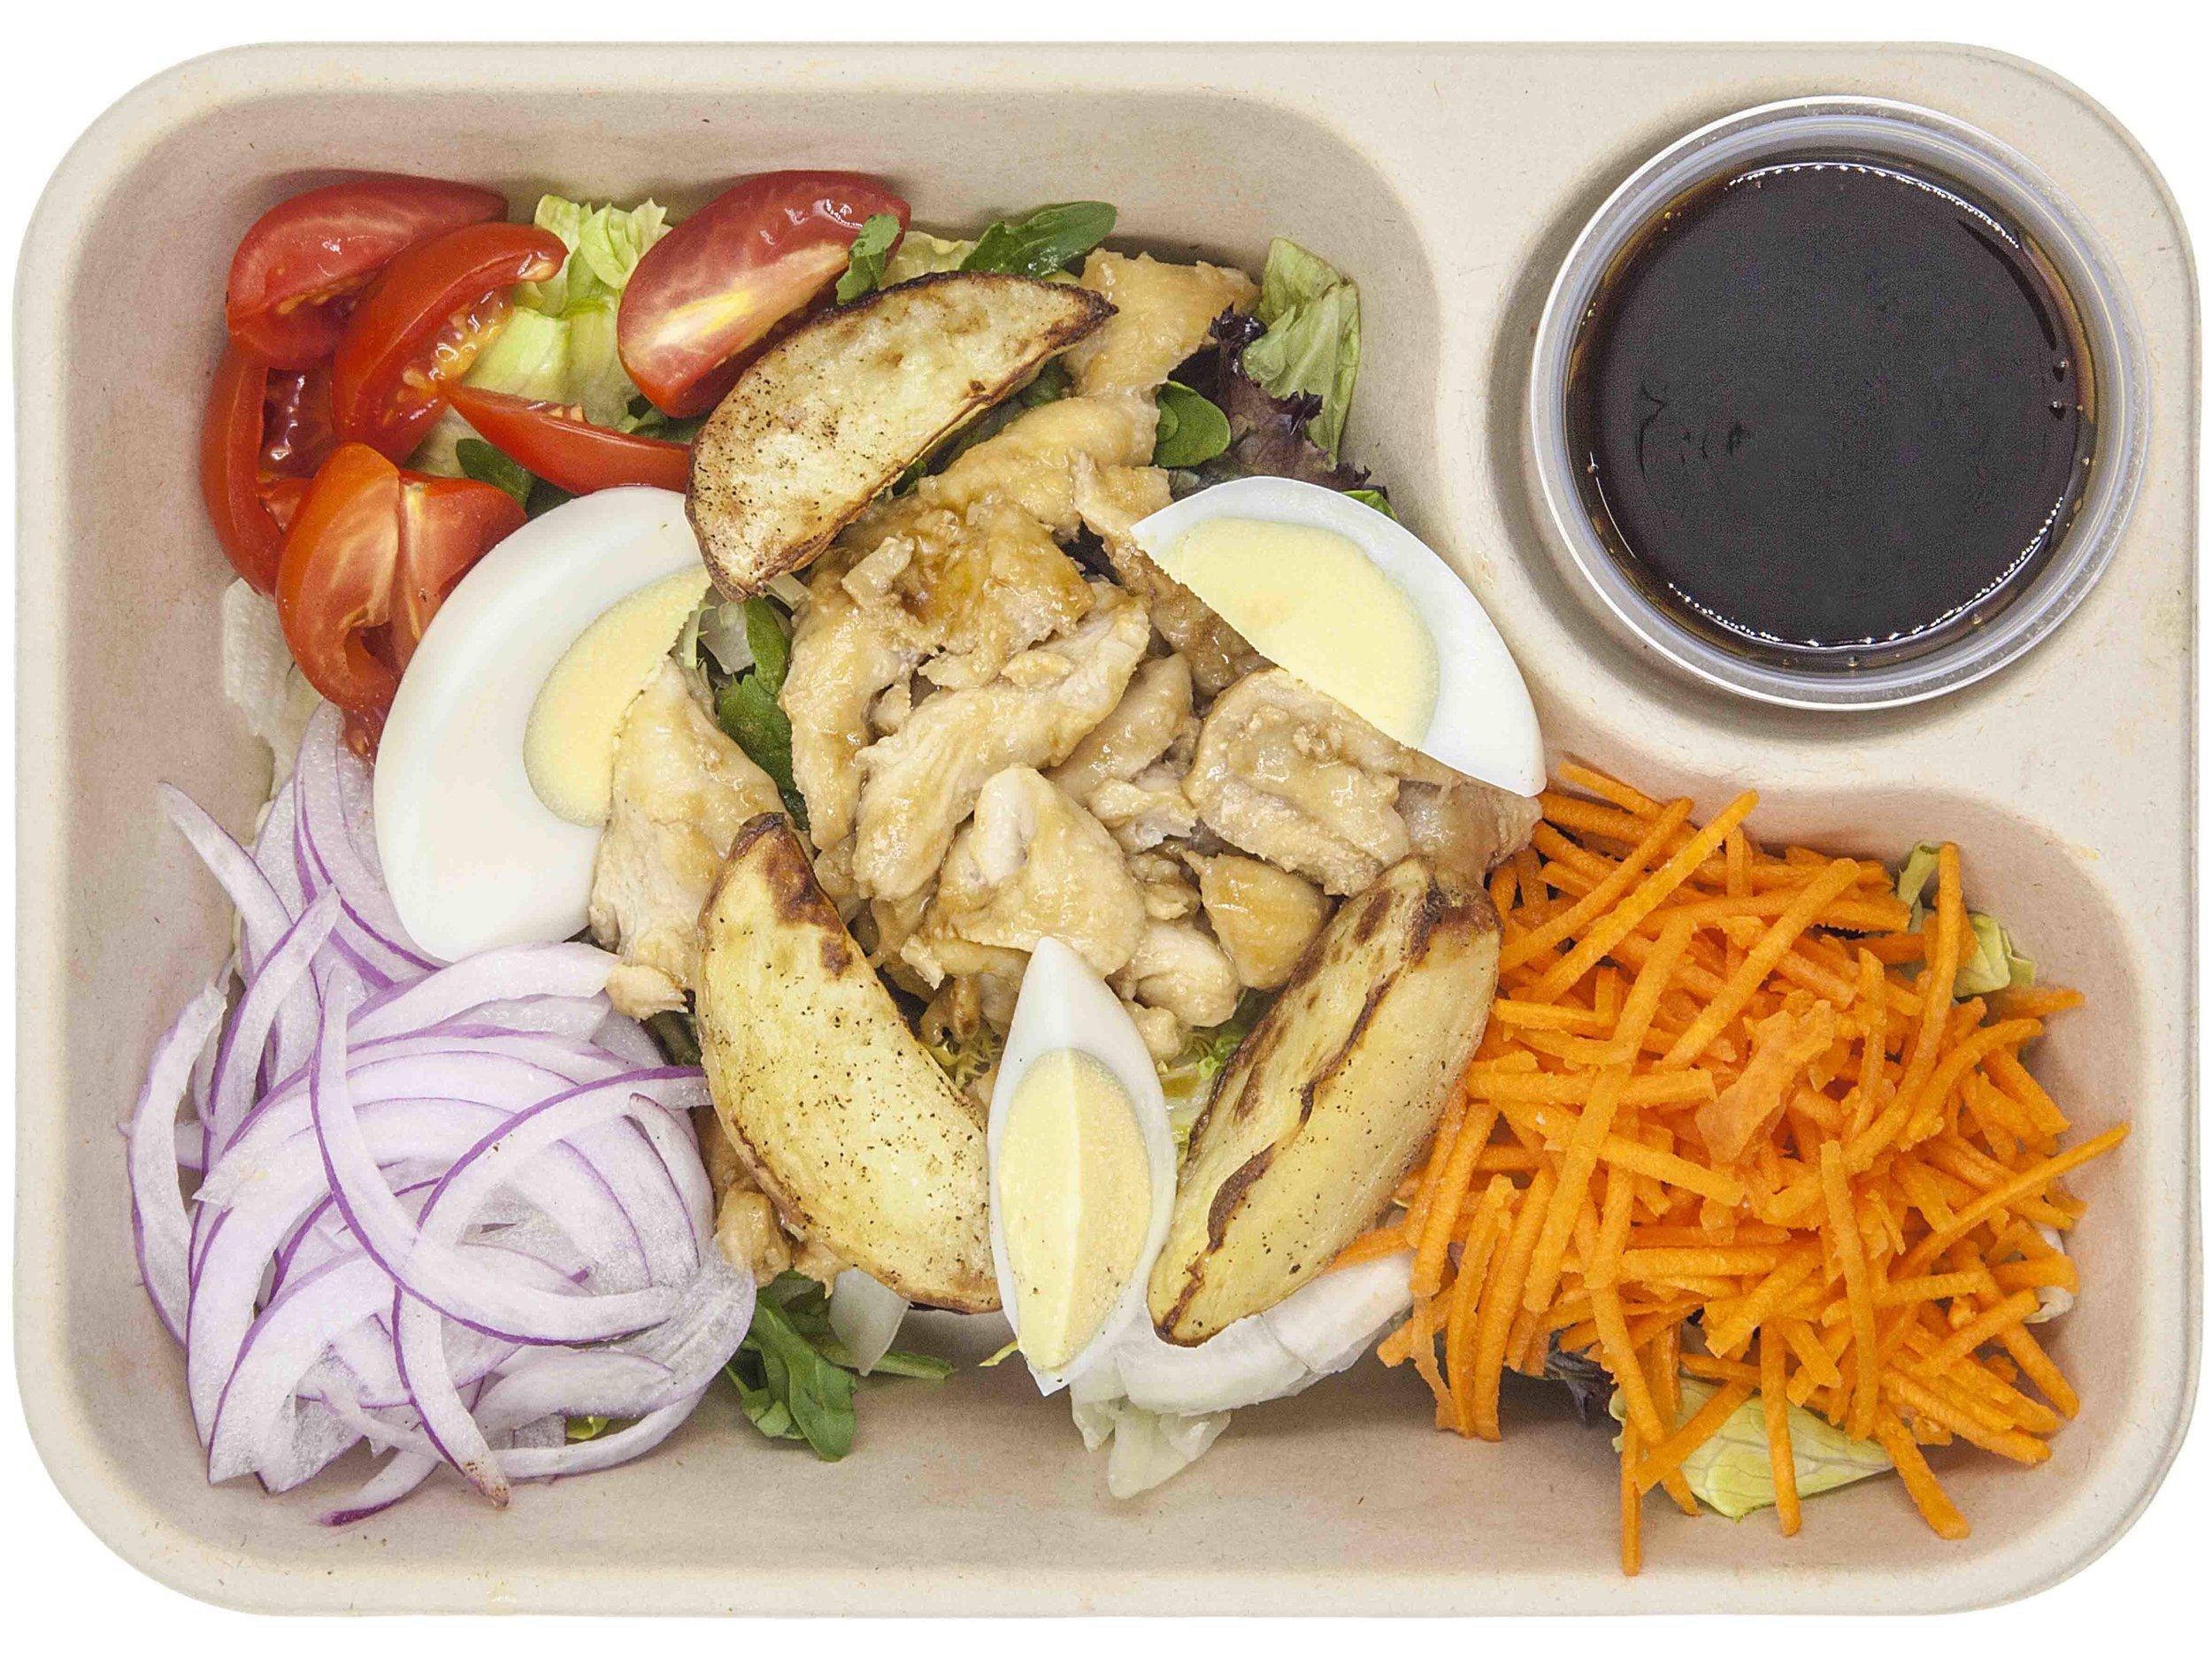 CHICKEN TERIYAKI383.6 KCAL PER SERVINGINGREDIENTS: mixed salad, shredded chicken breast, roasted new potato, egg, carrots, onion, cherry tomato, teriyaki sauce -